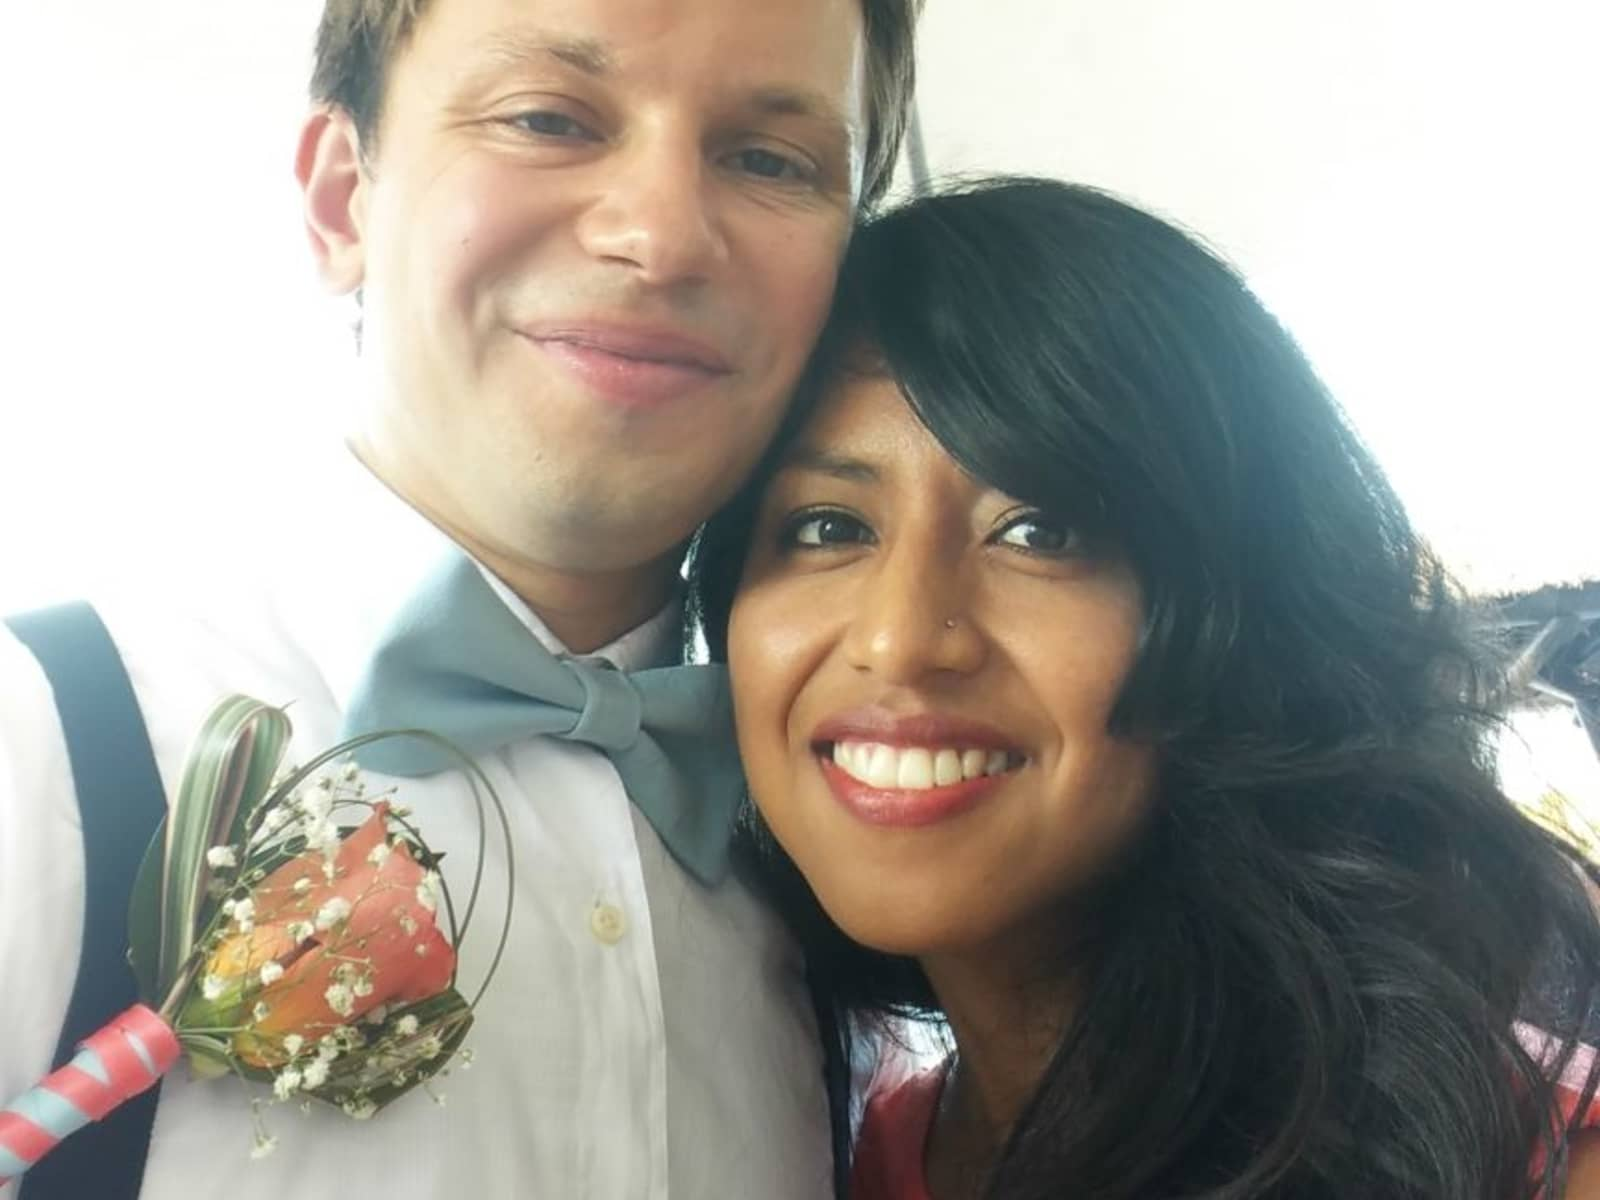 Nicolas & jimena & Jimena from Madrid, Spain